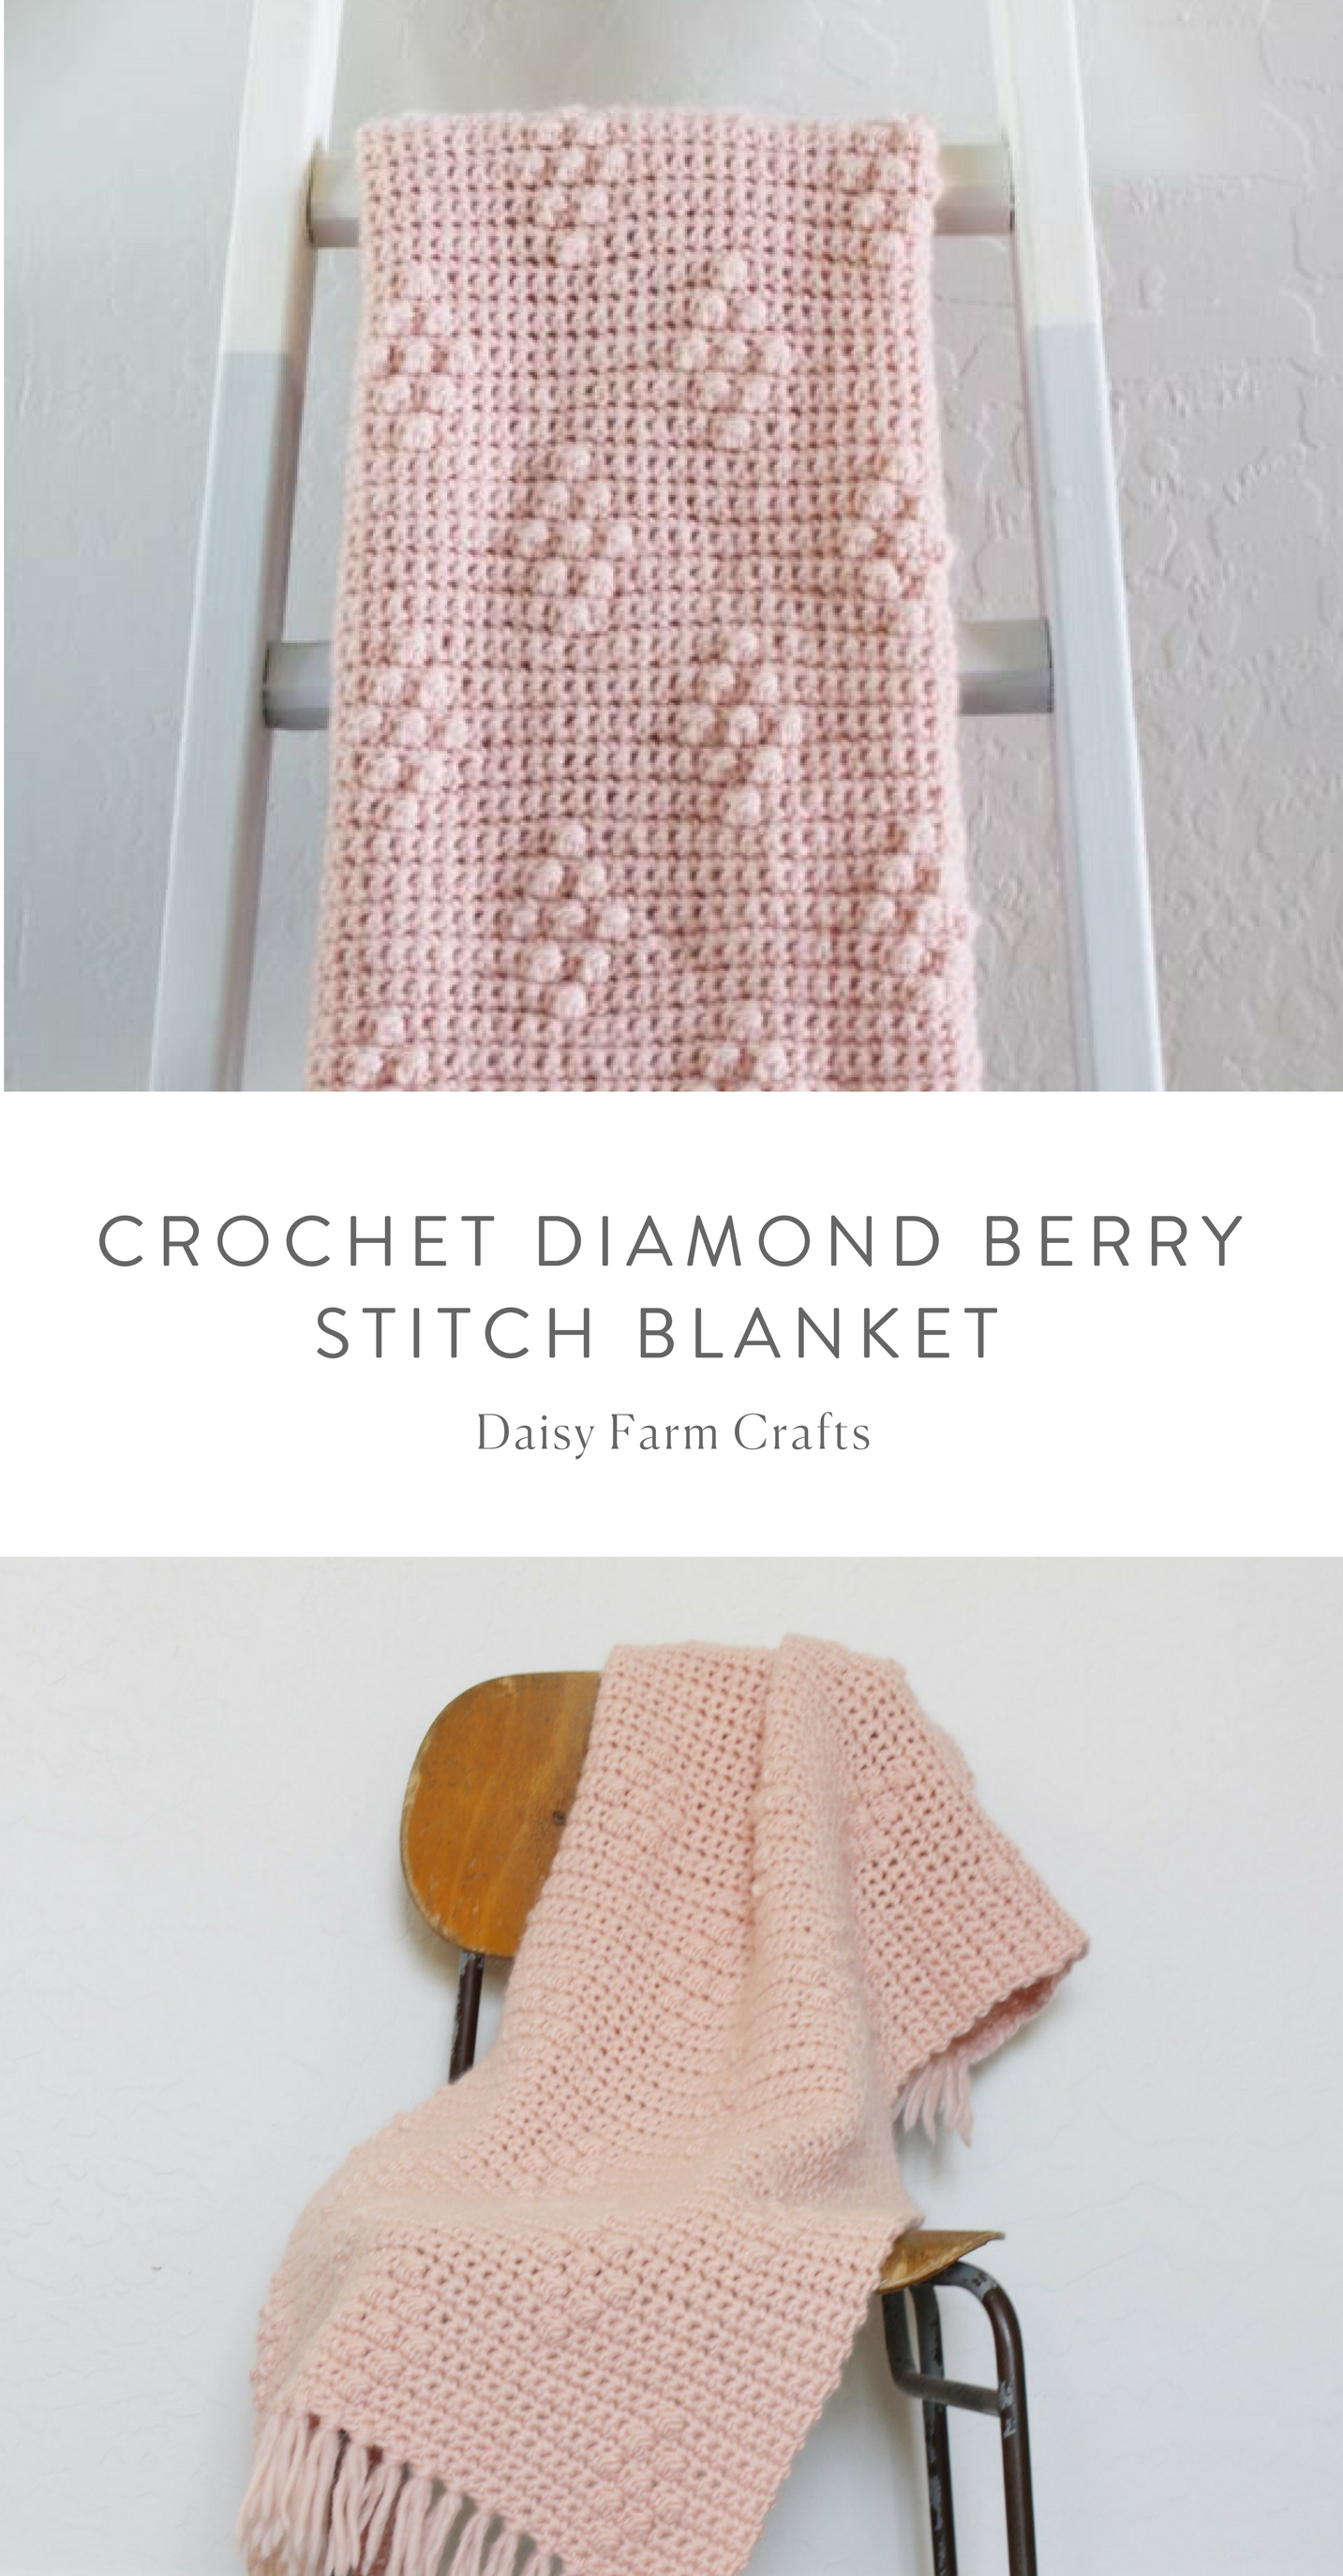 Free Pattern - Crochet Diamond Berry Stitch Blanket | Crochet ...